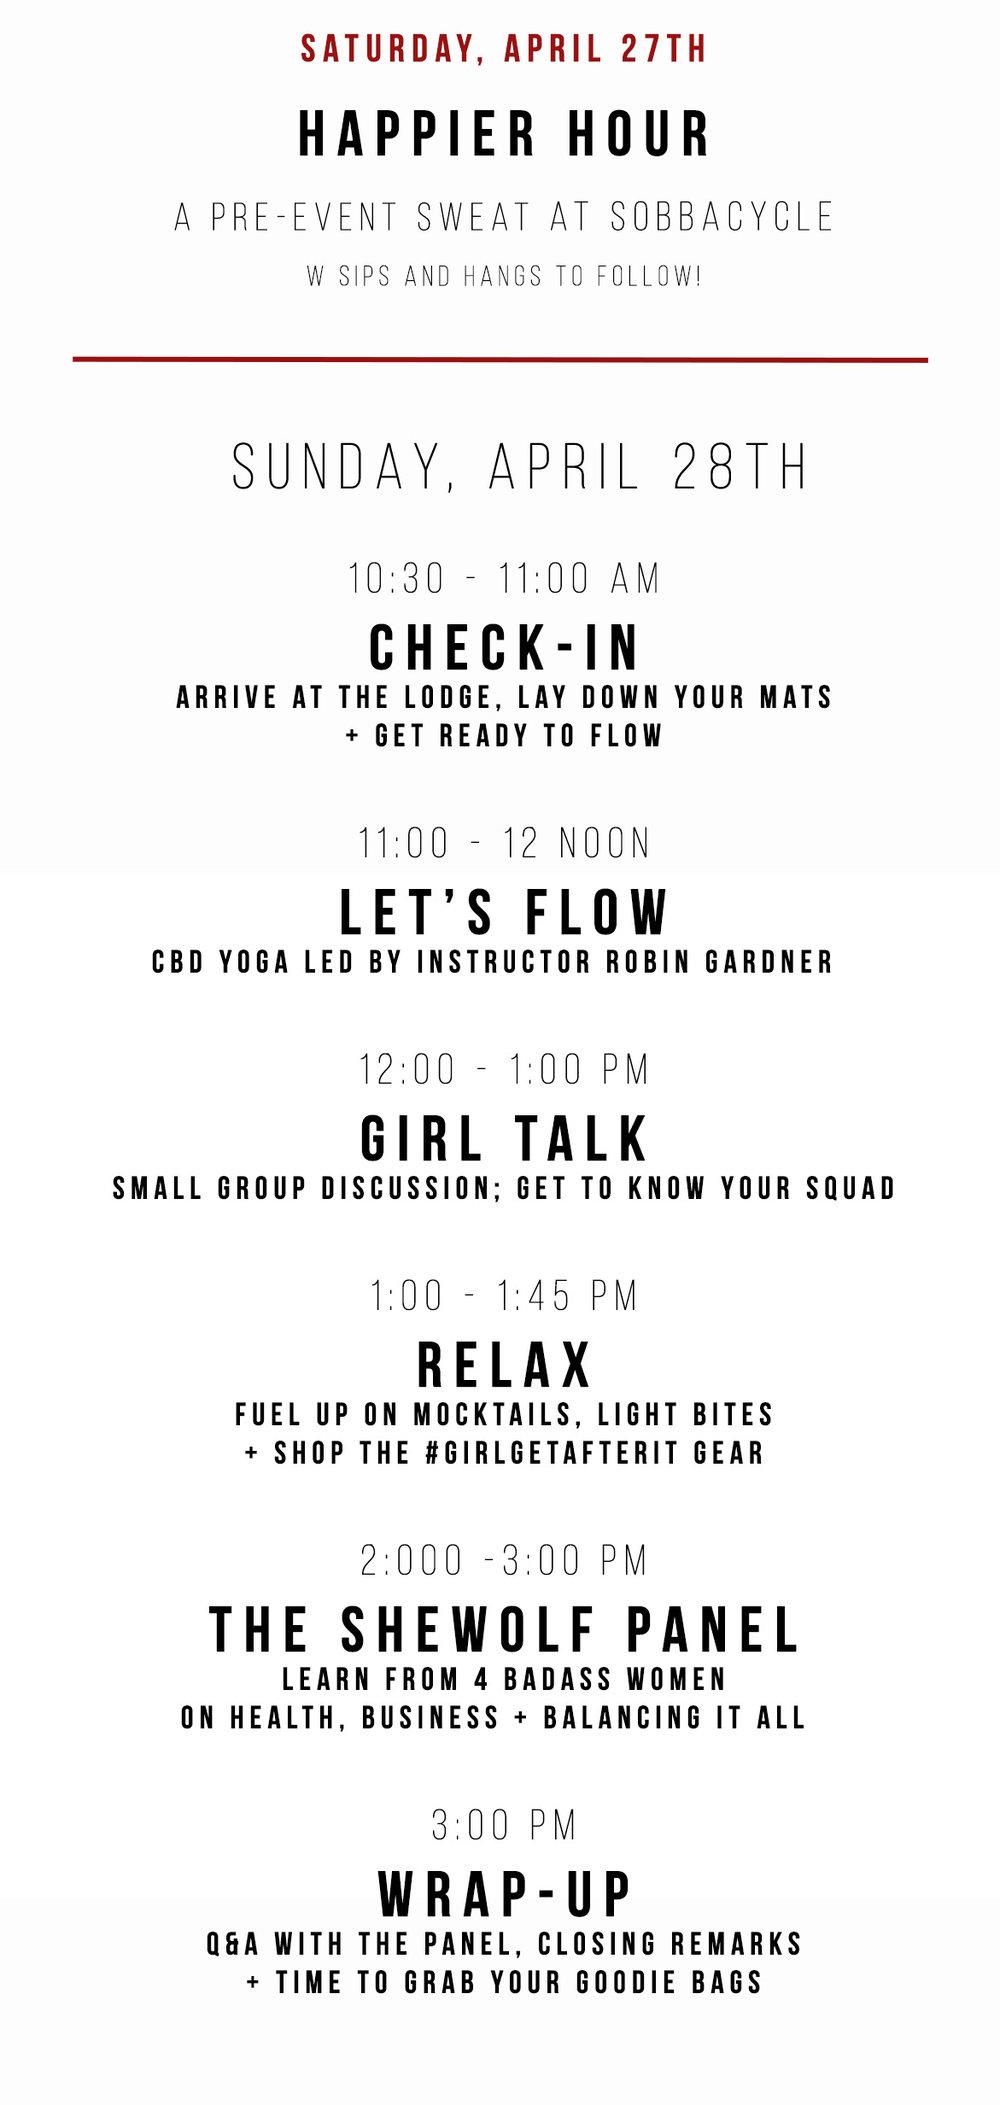 GIRL+TALK+Whitefish+Schedule.jpeg